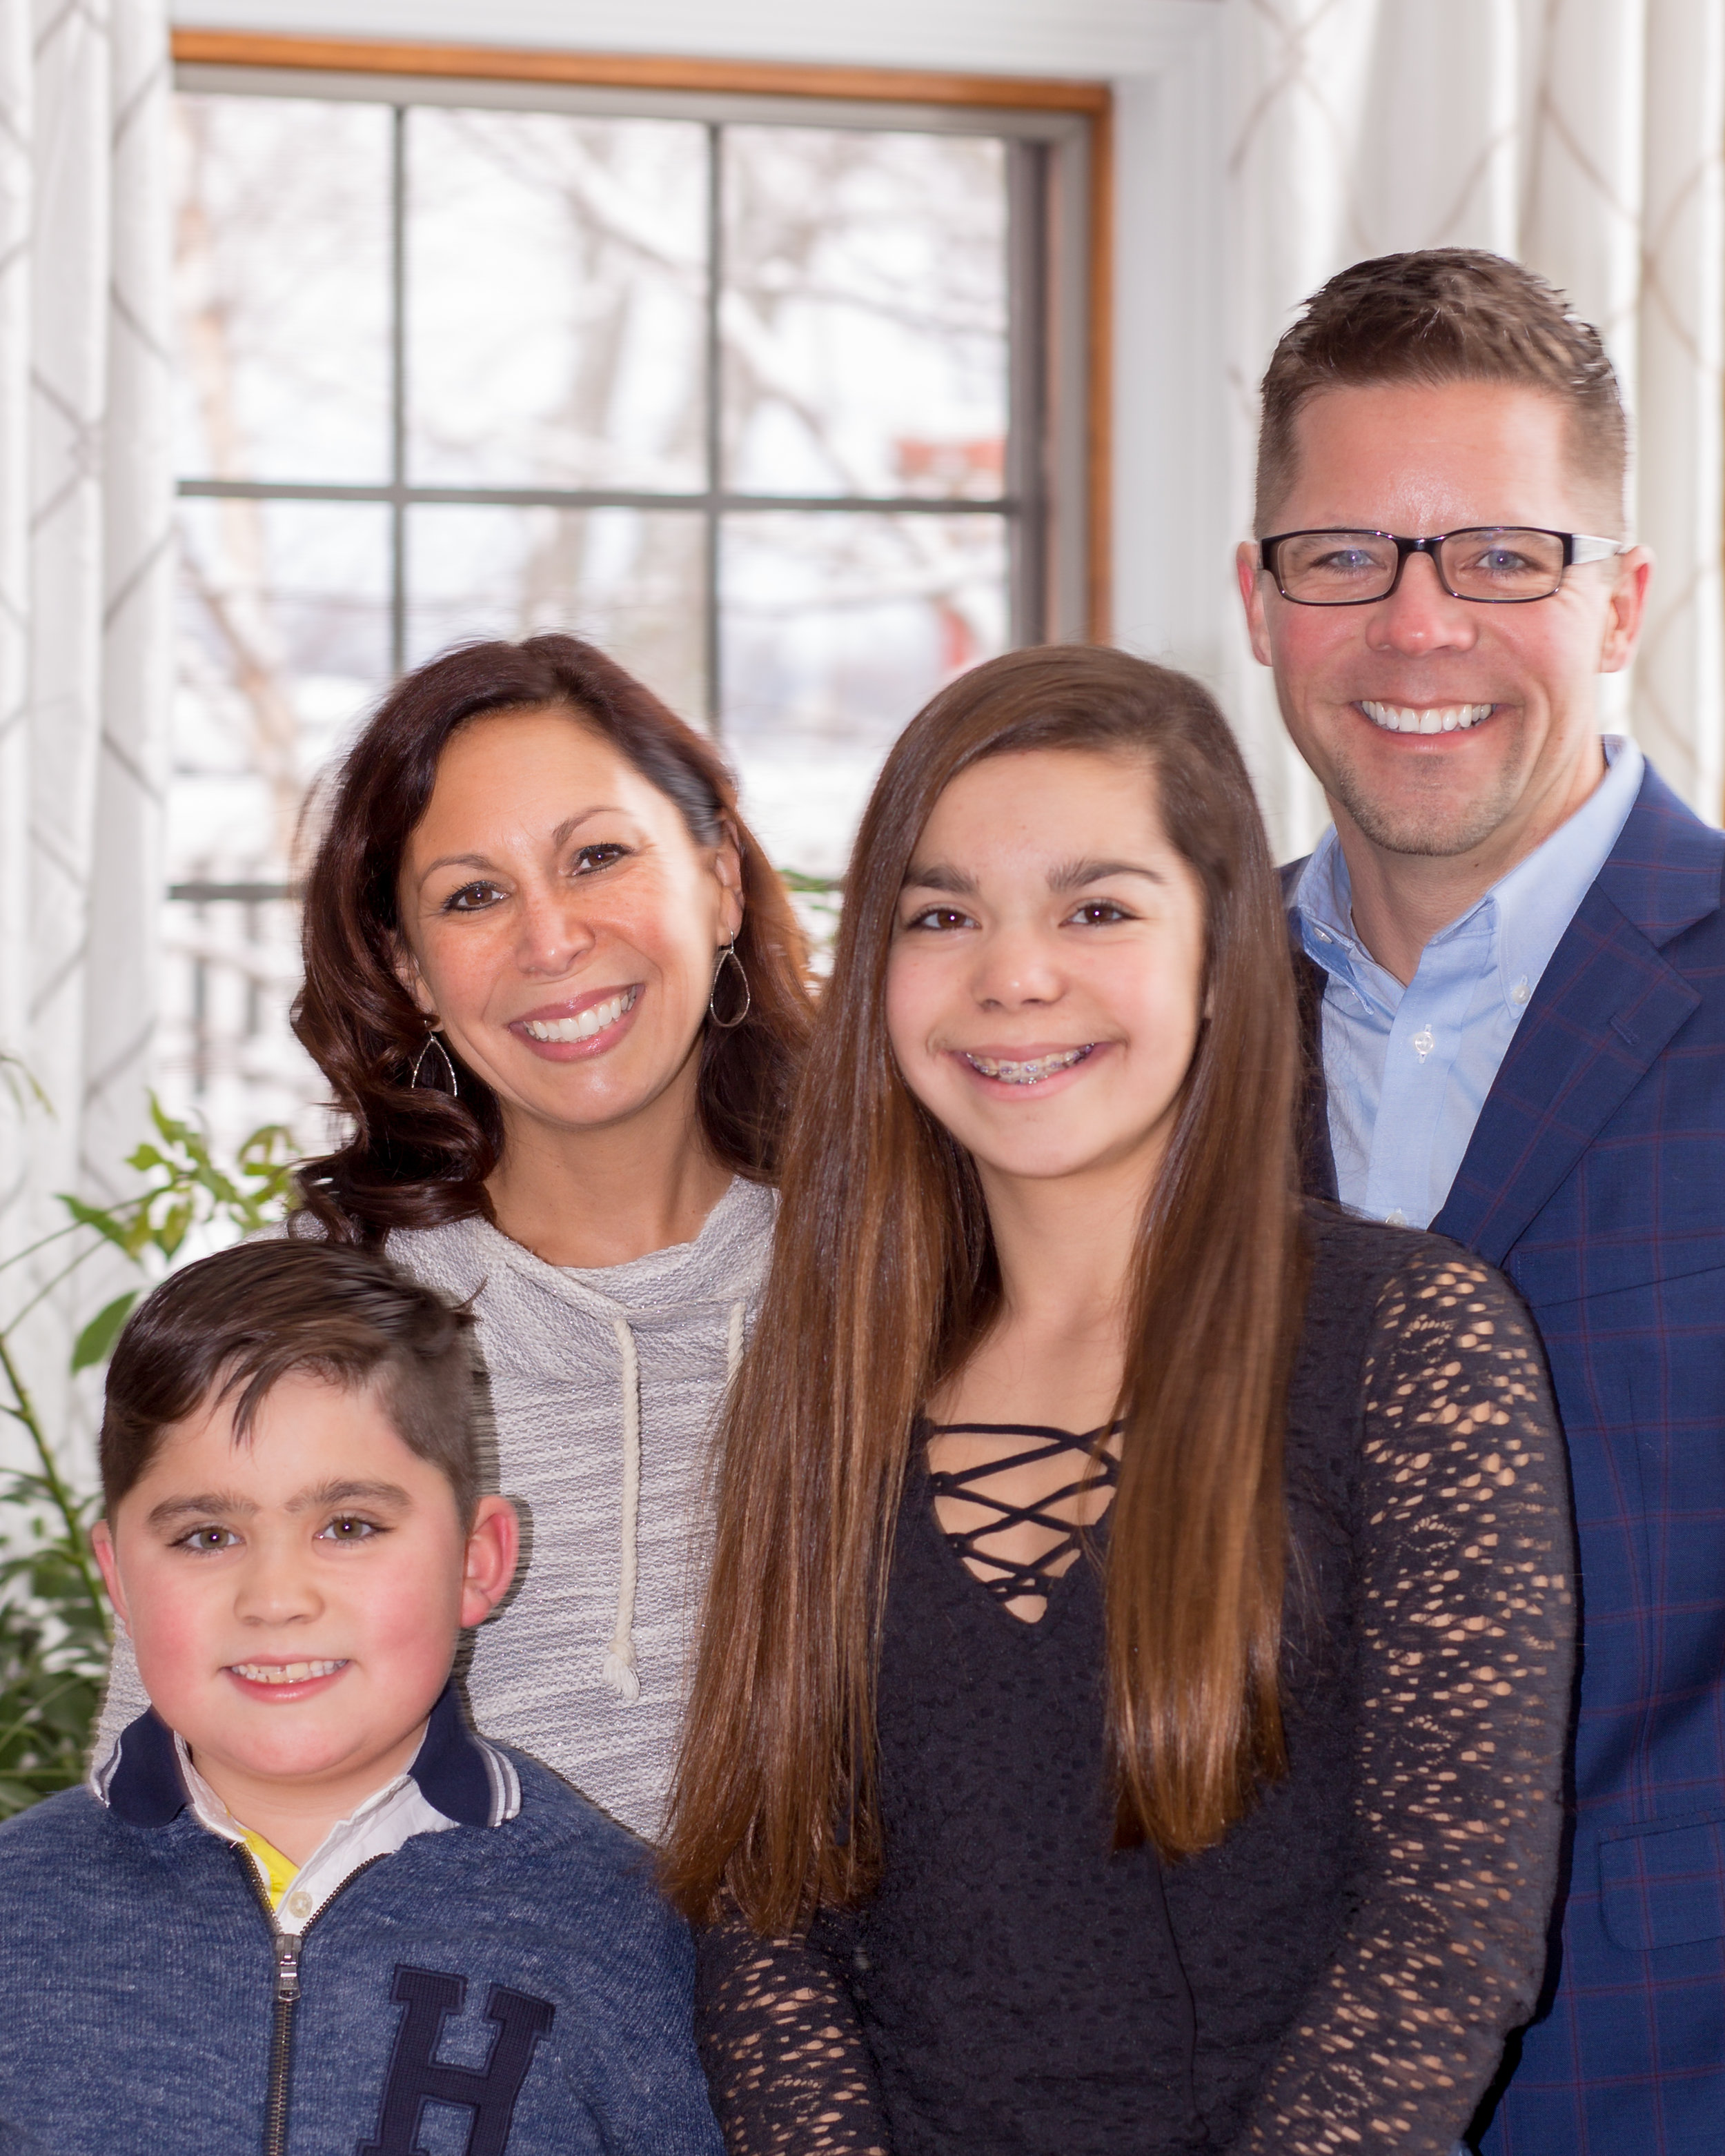 Indoor Winter Family Photo